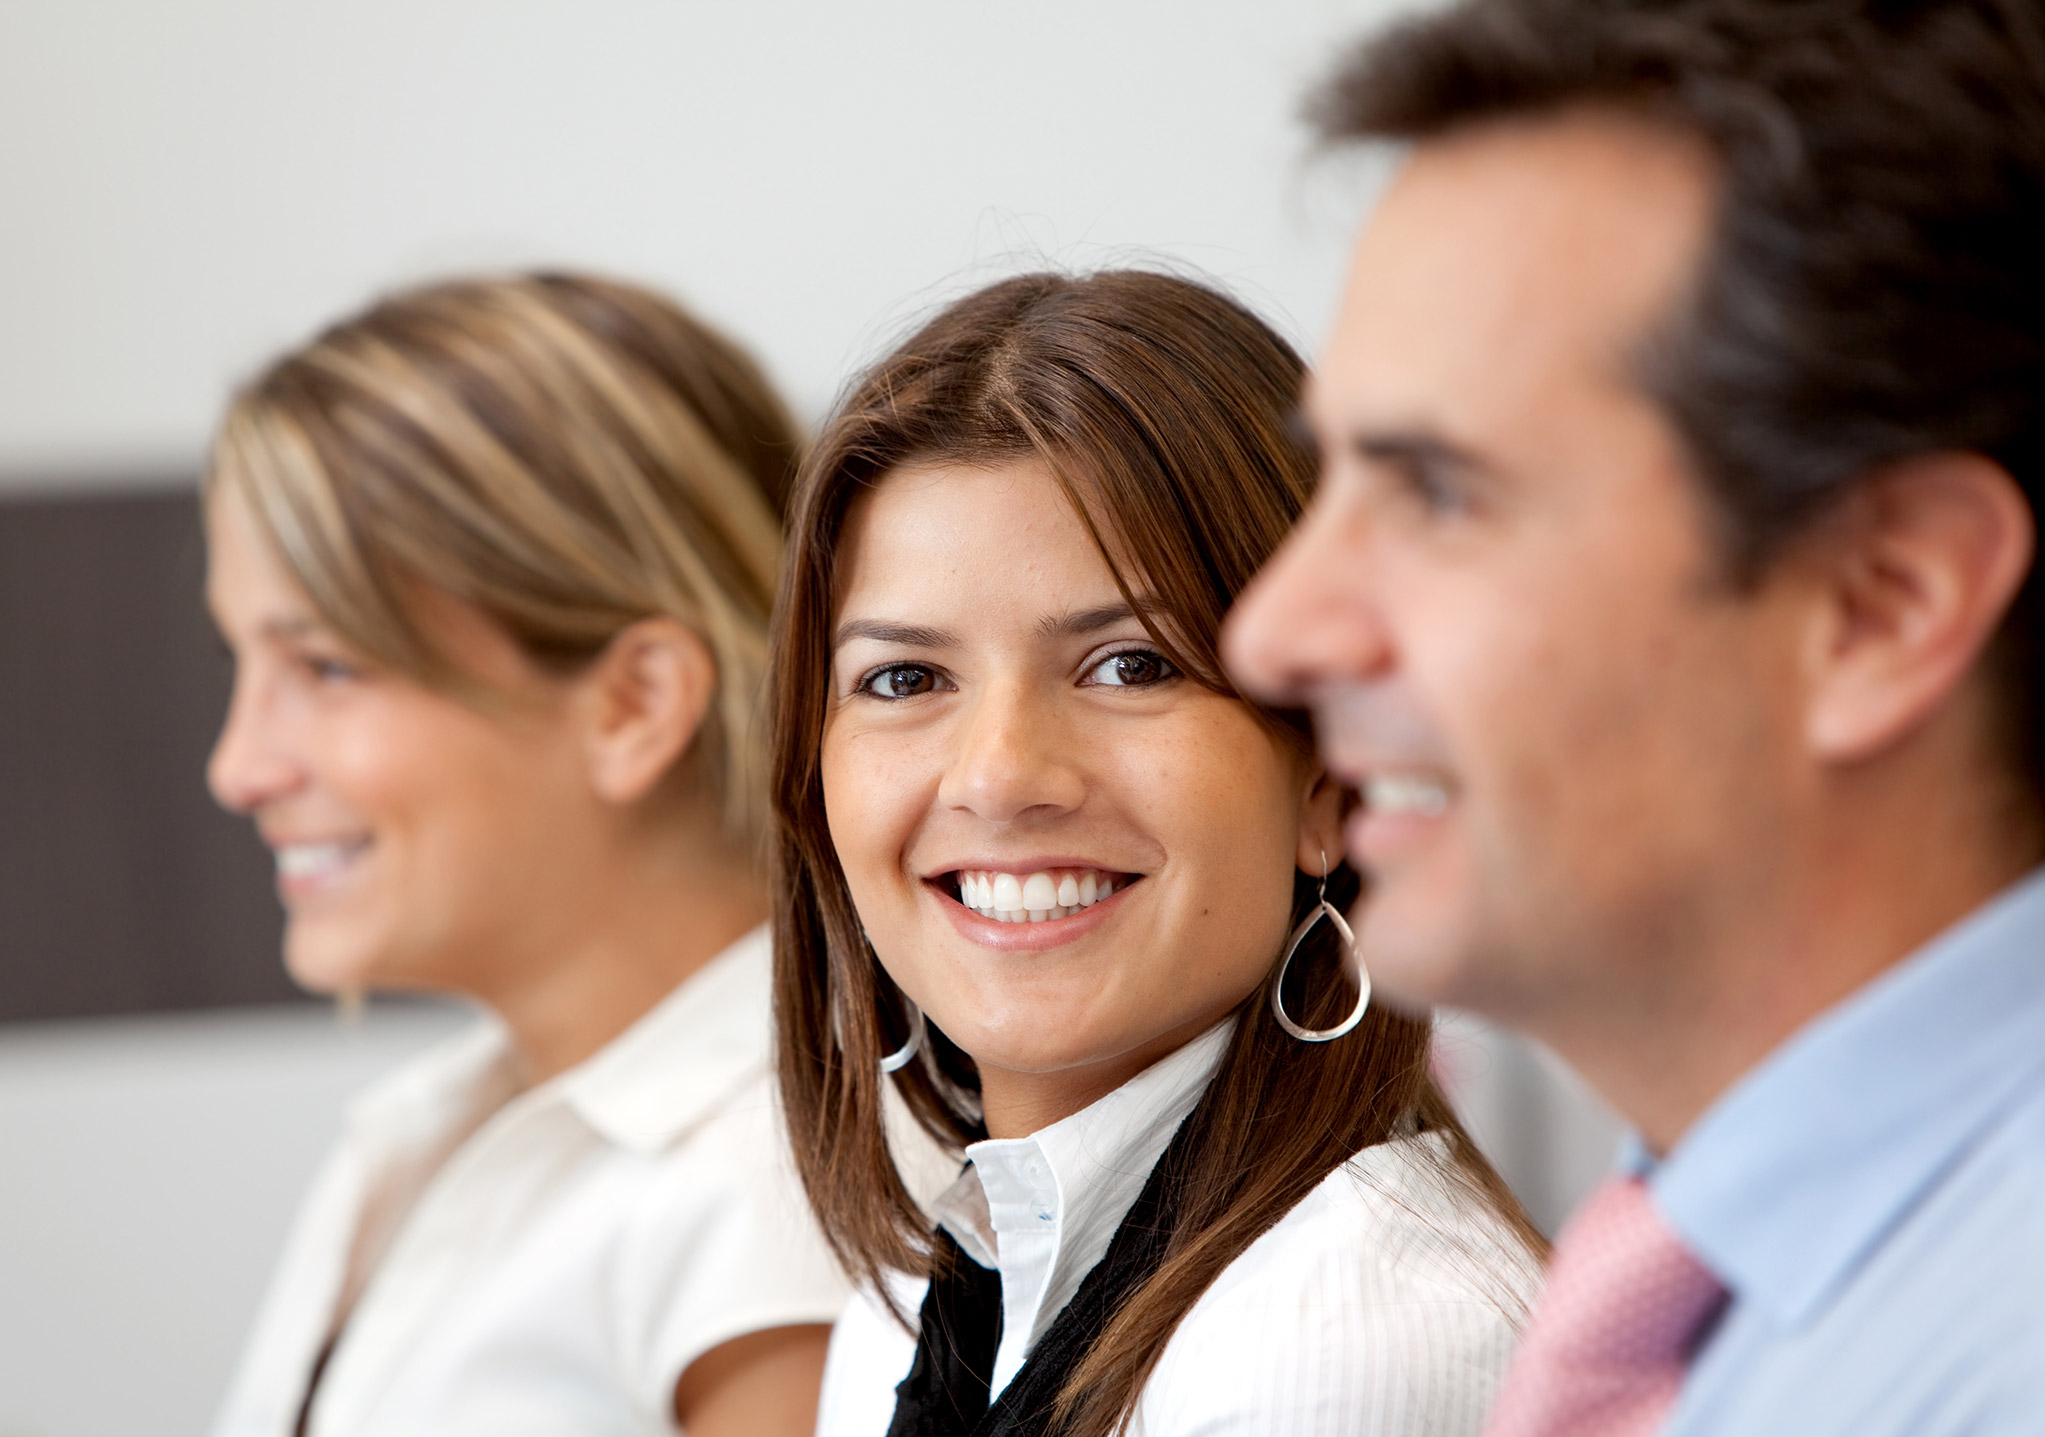 Small Business Concierge workshops